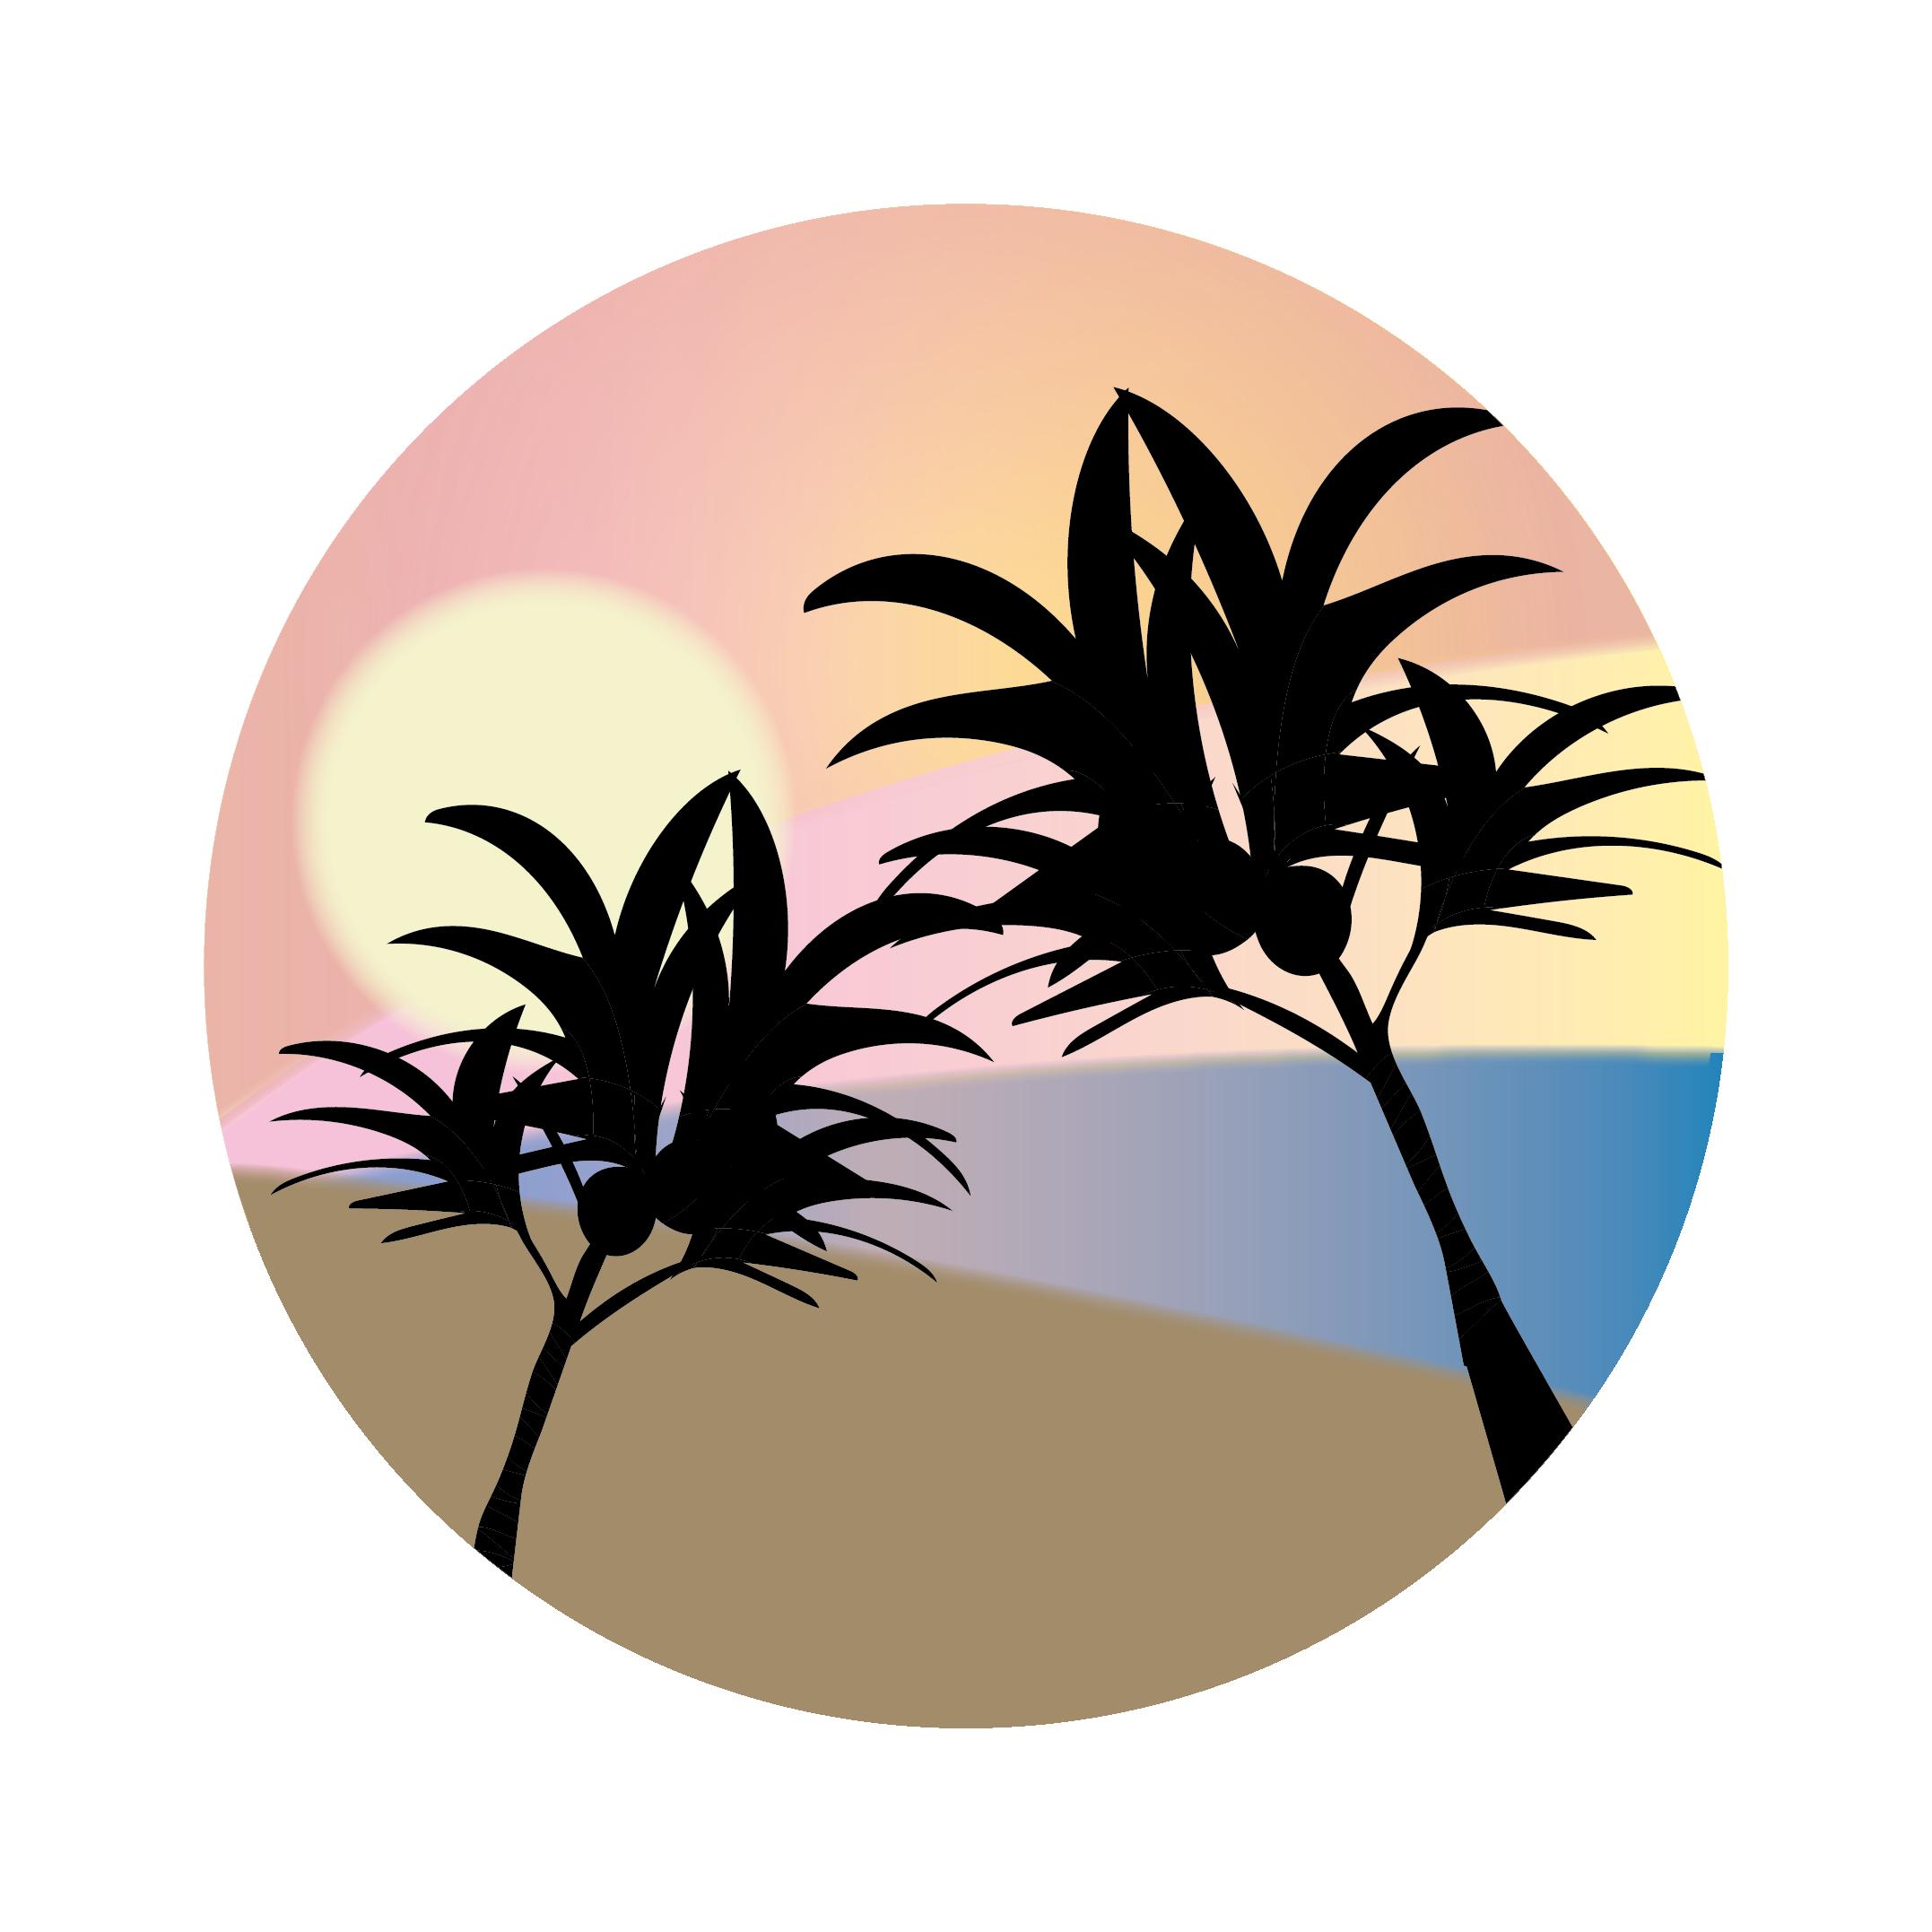 Sunset clipart hawaiian sunset. Silhouette transprent png free